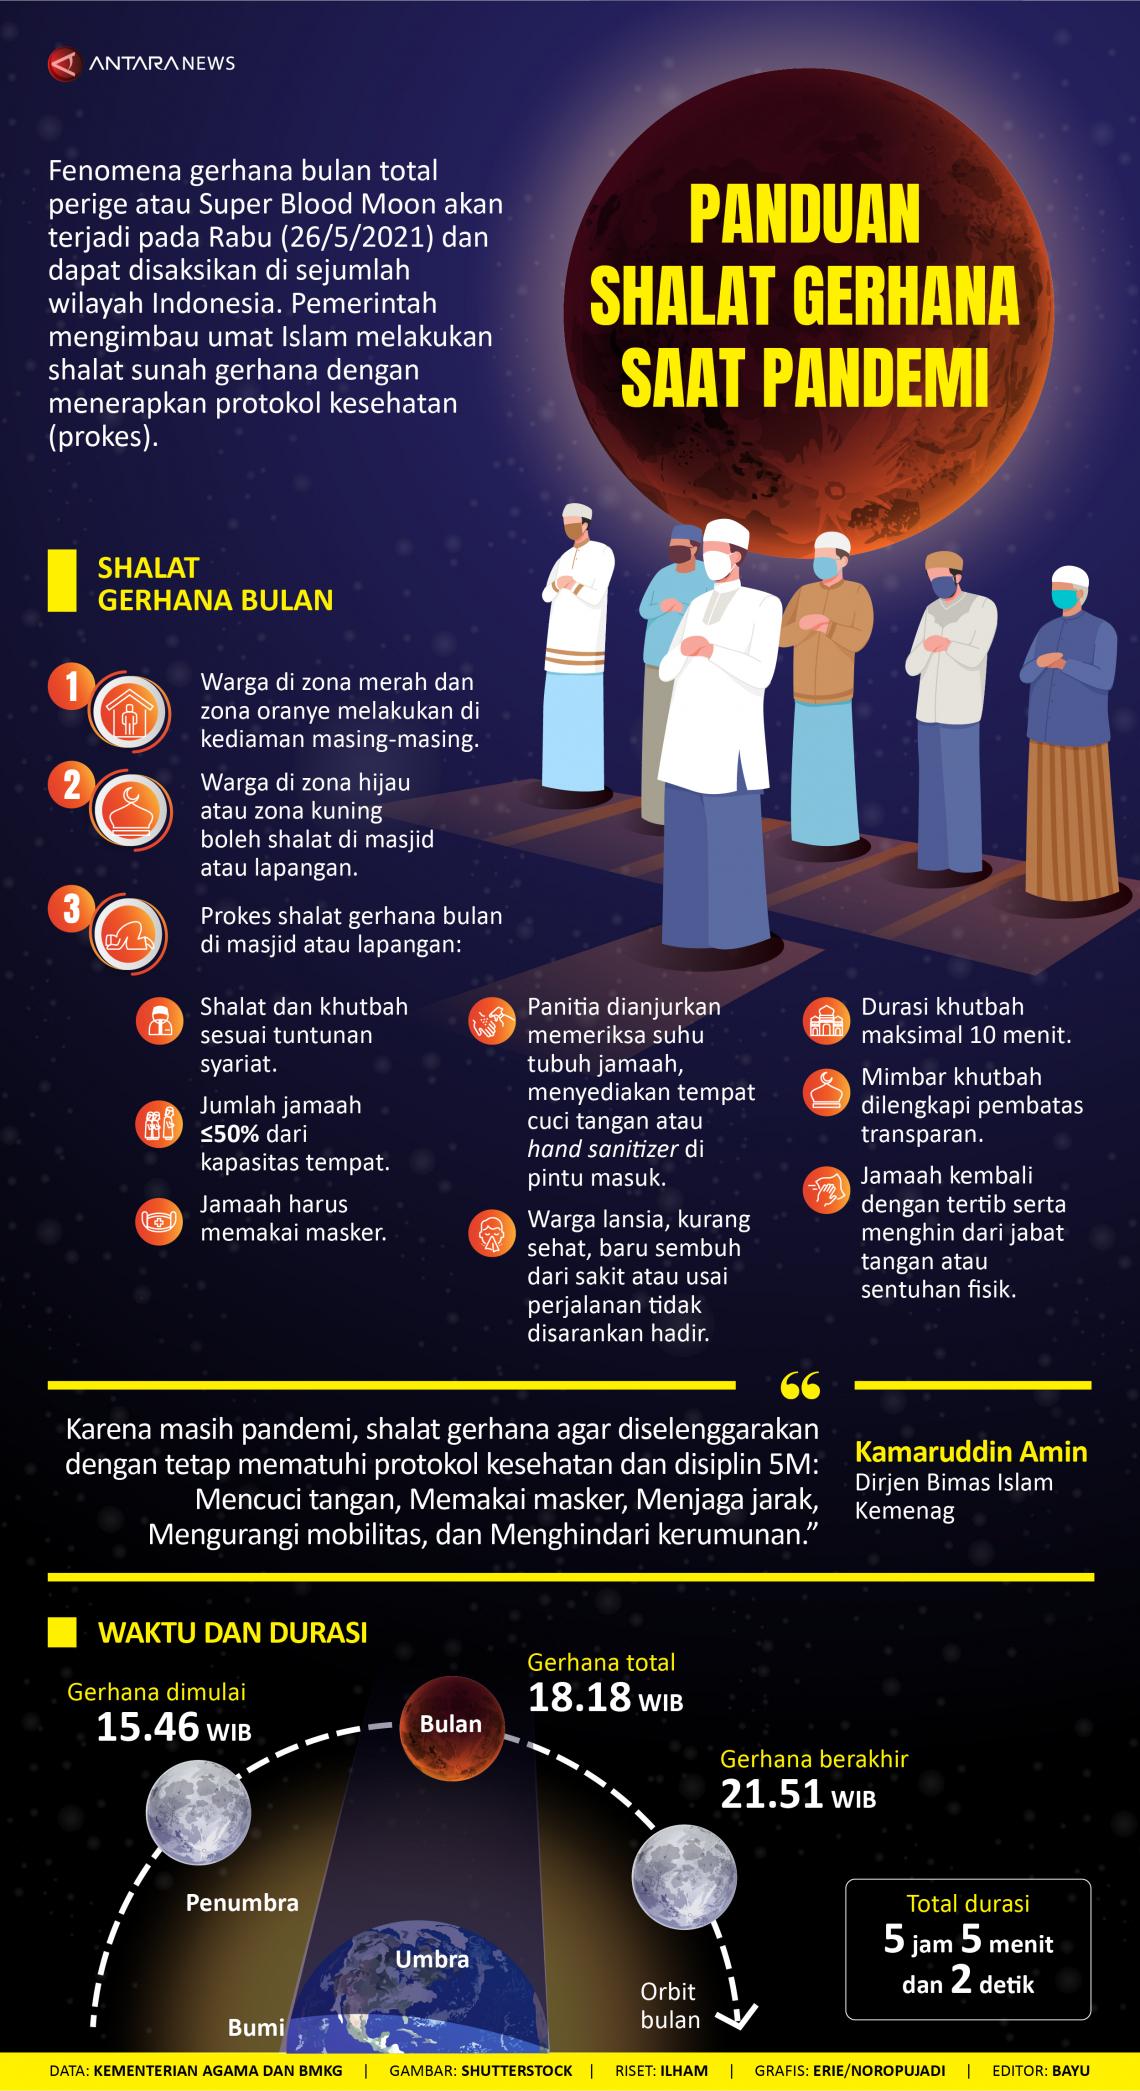 Panduan shalat gerhana saat pandemi